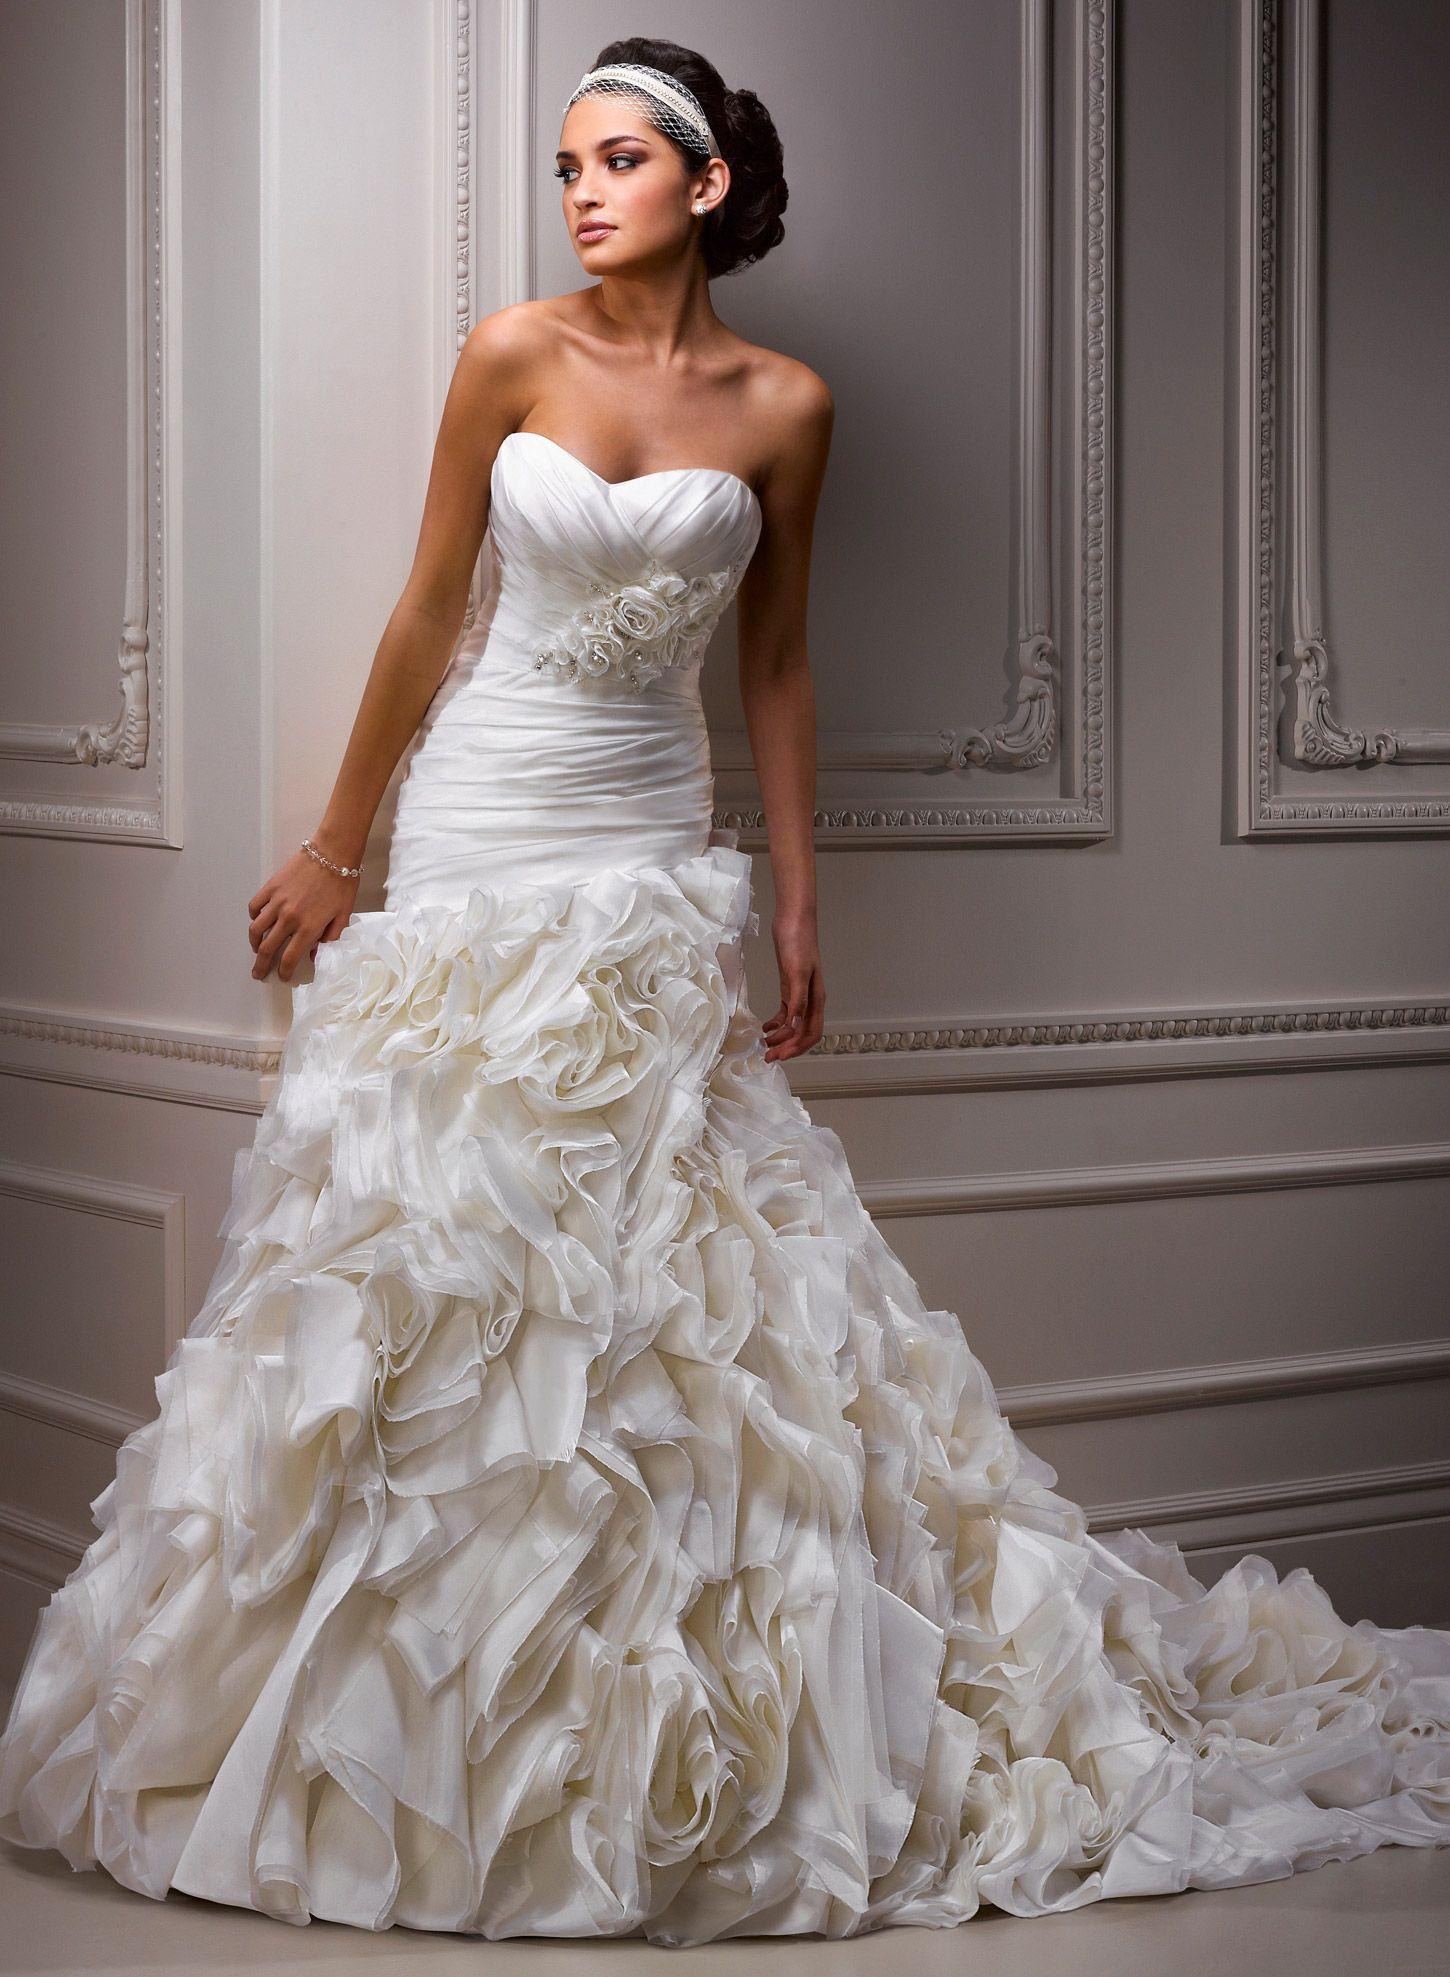 Maggie Sottero Alandra Size 2 Wedding Dress